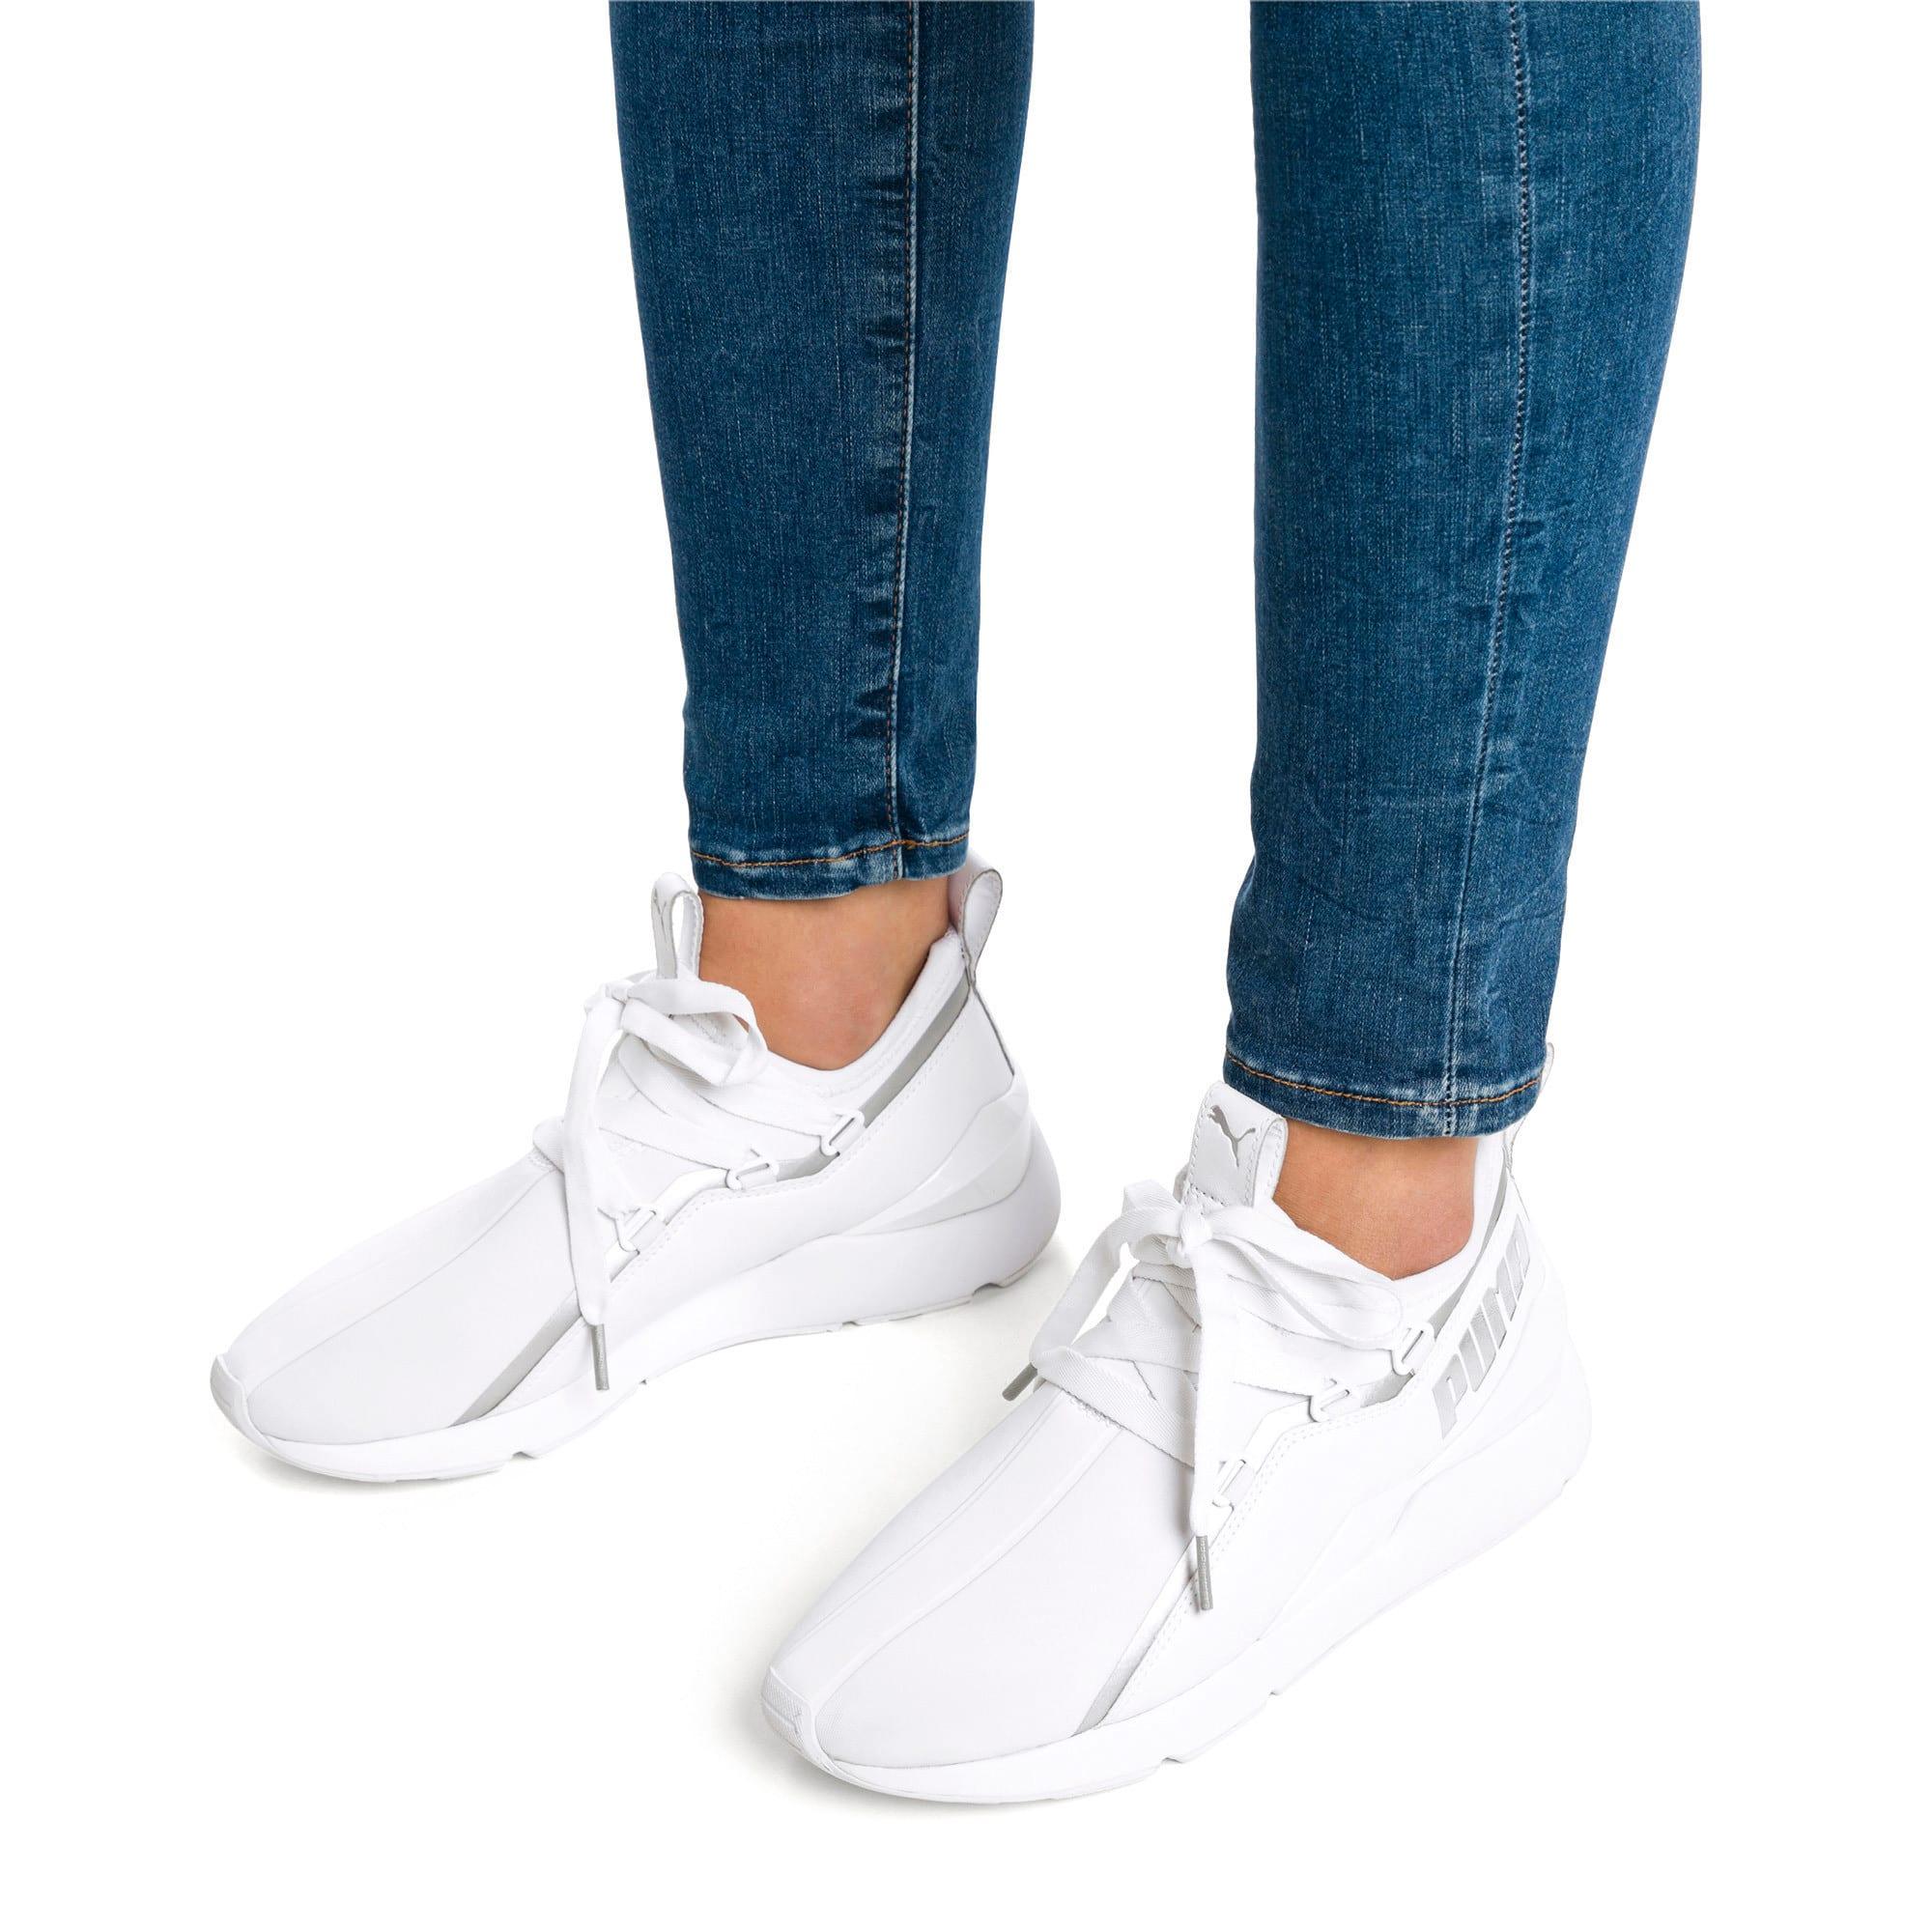 Thumbnail 2 of Muse 2 Trailblazer Women's Sneakers, Puma White-Puma Silver, medium